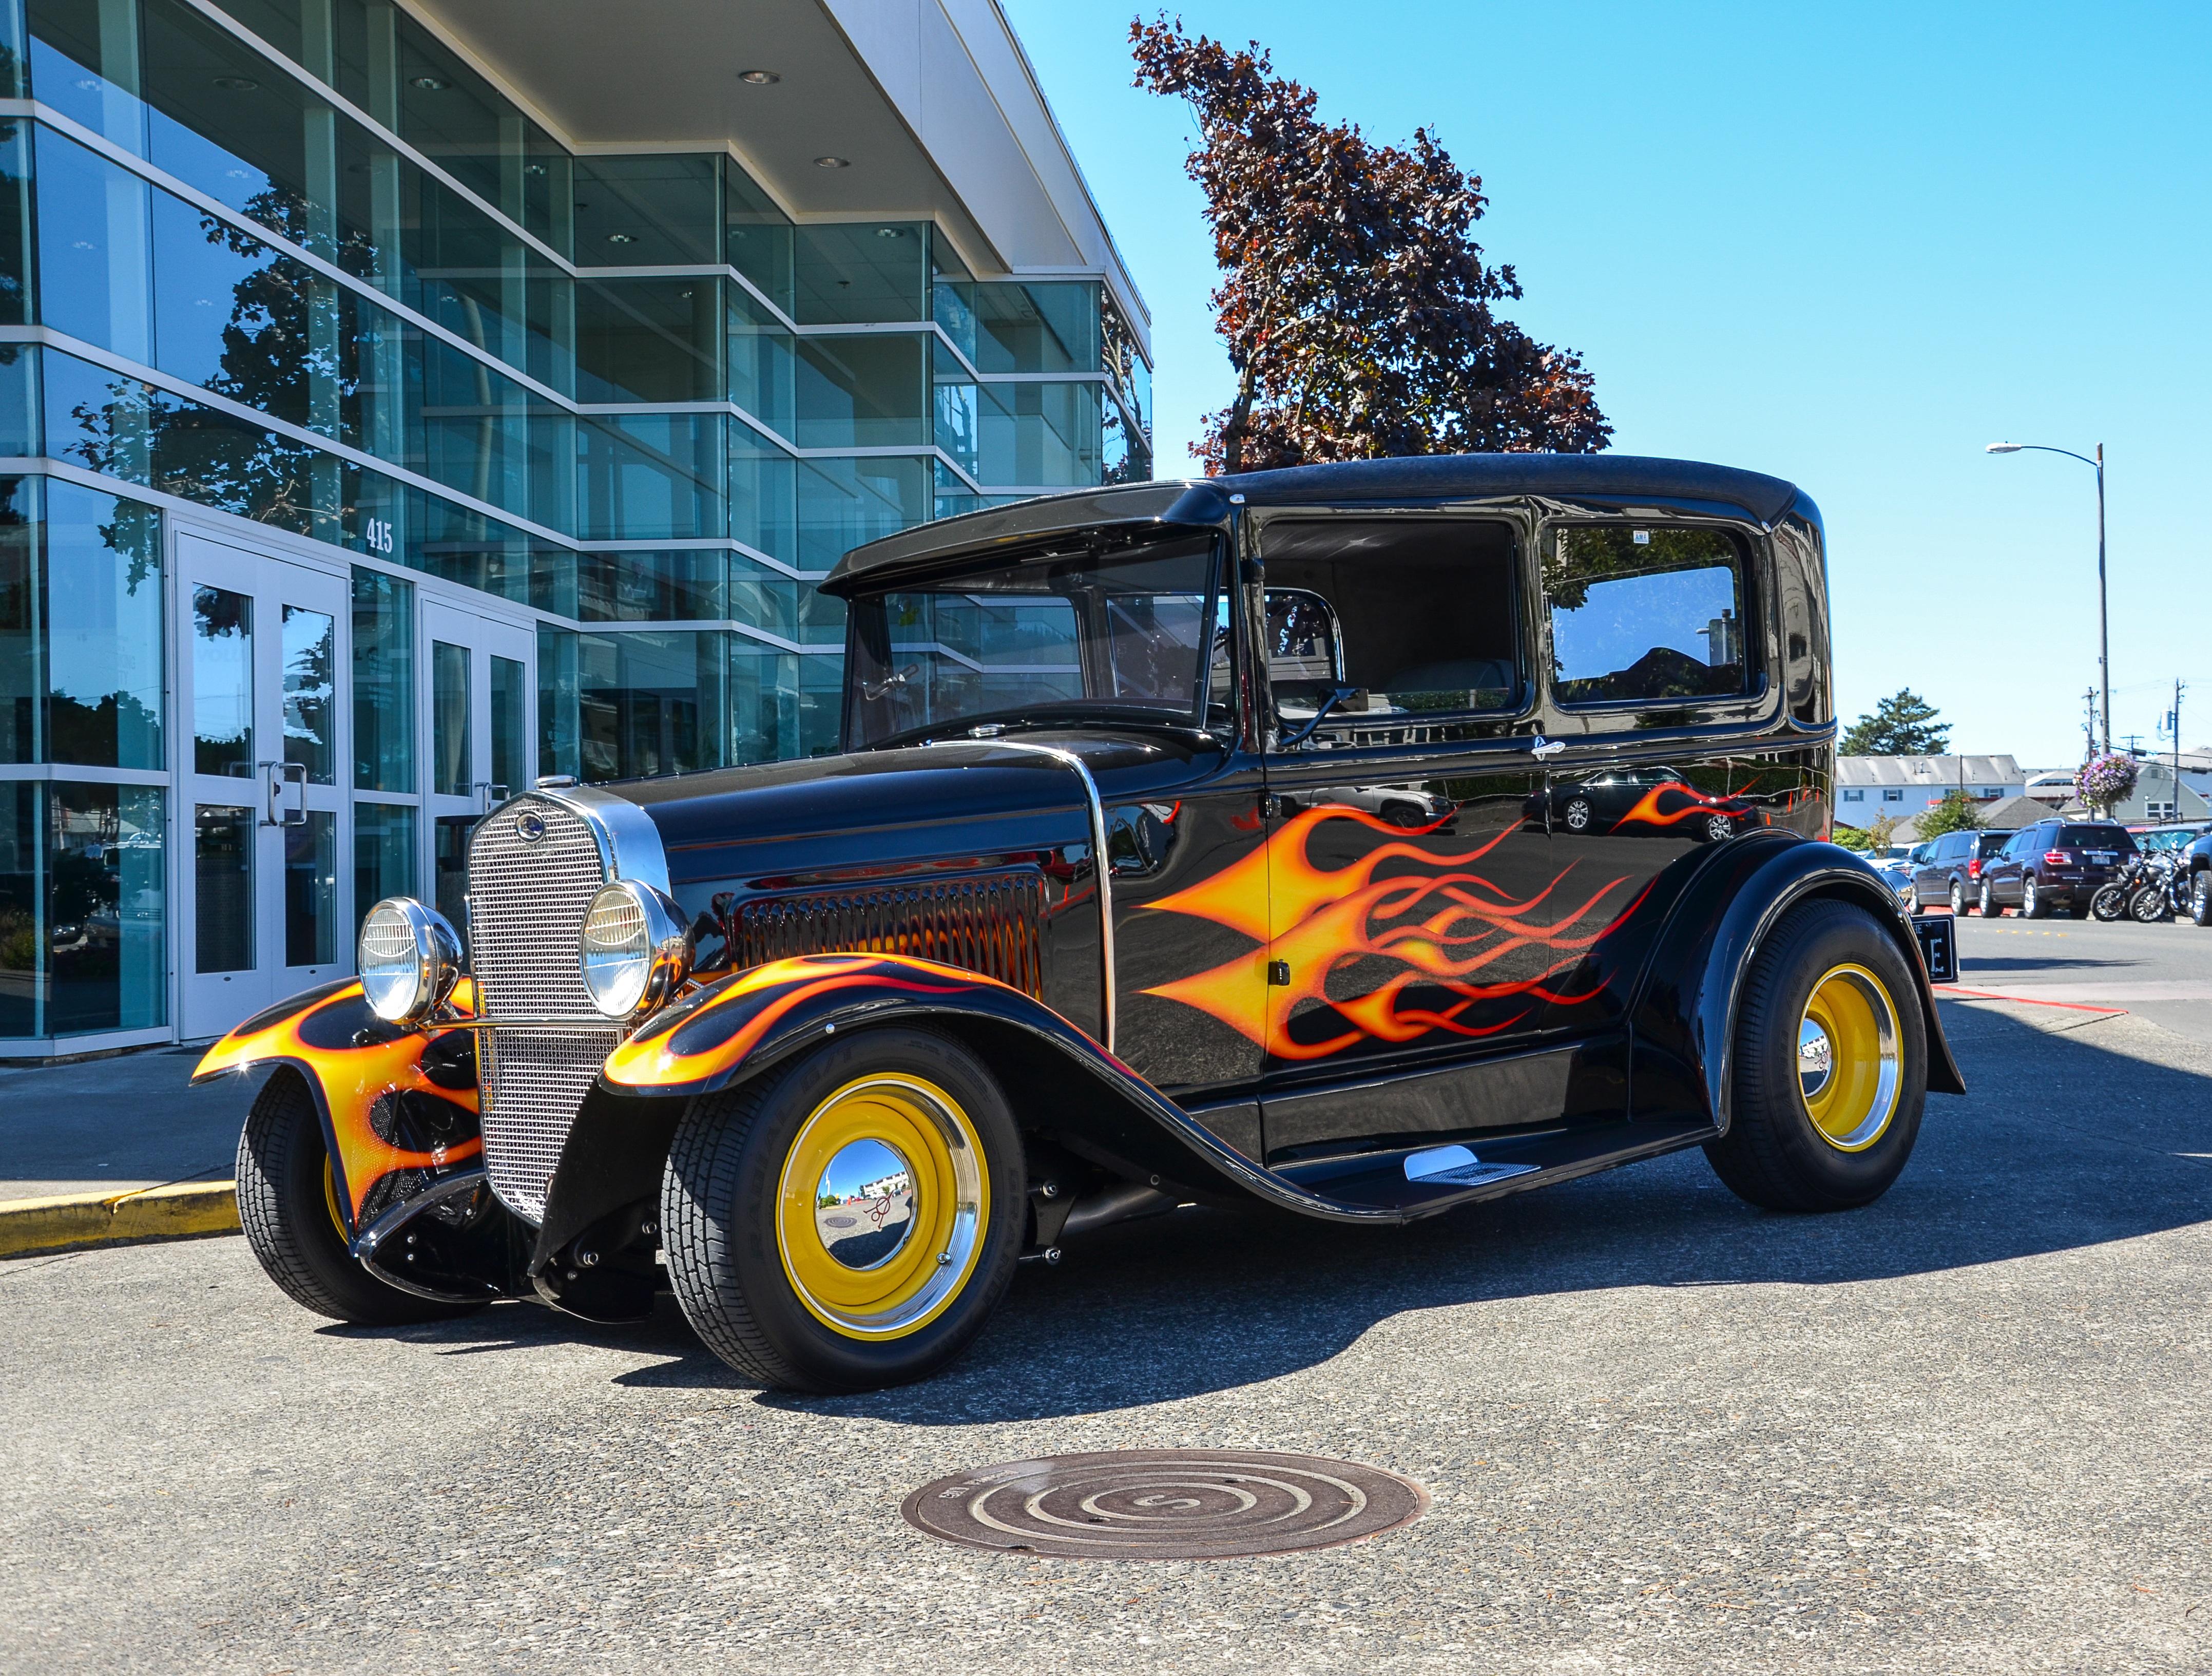 Free Images Seaside Usa America Old Car Automotive Motor - Seaside oregon car show